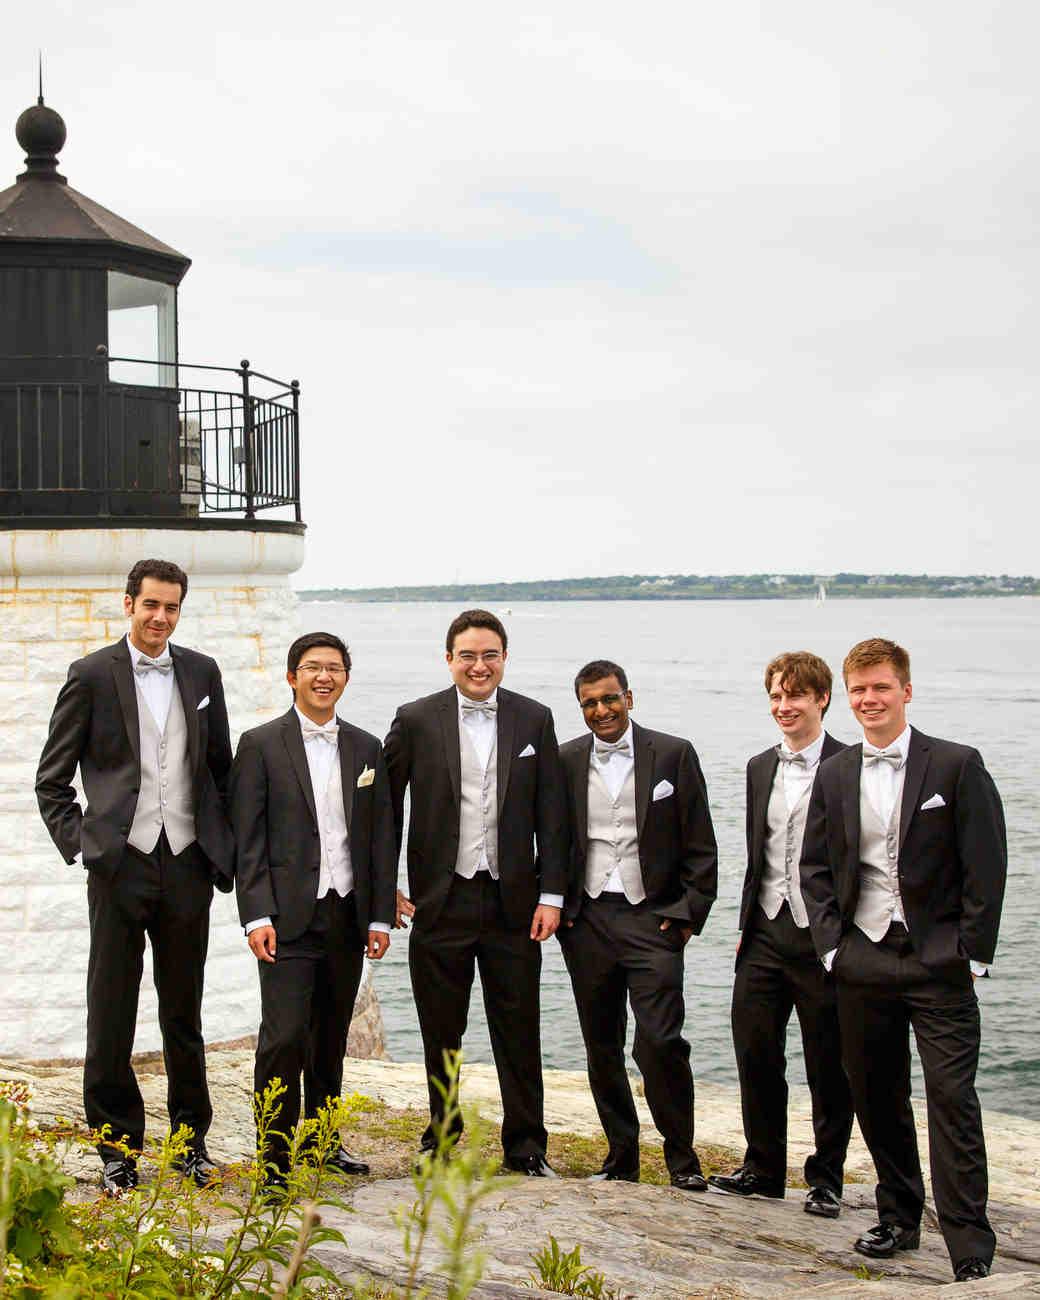 kristel-austin-wedding-groomsmen-09-s11860-0415.jpg